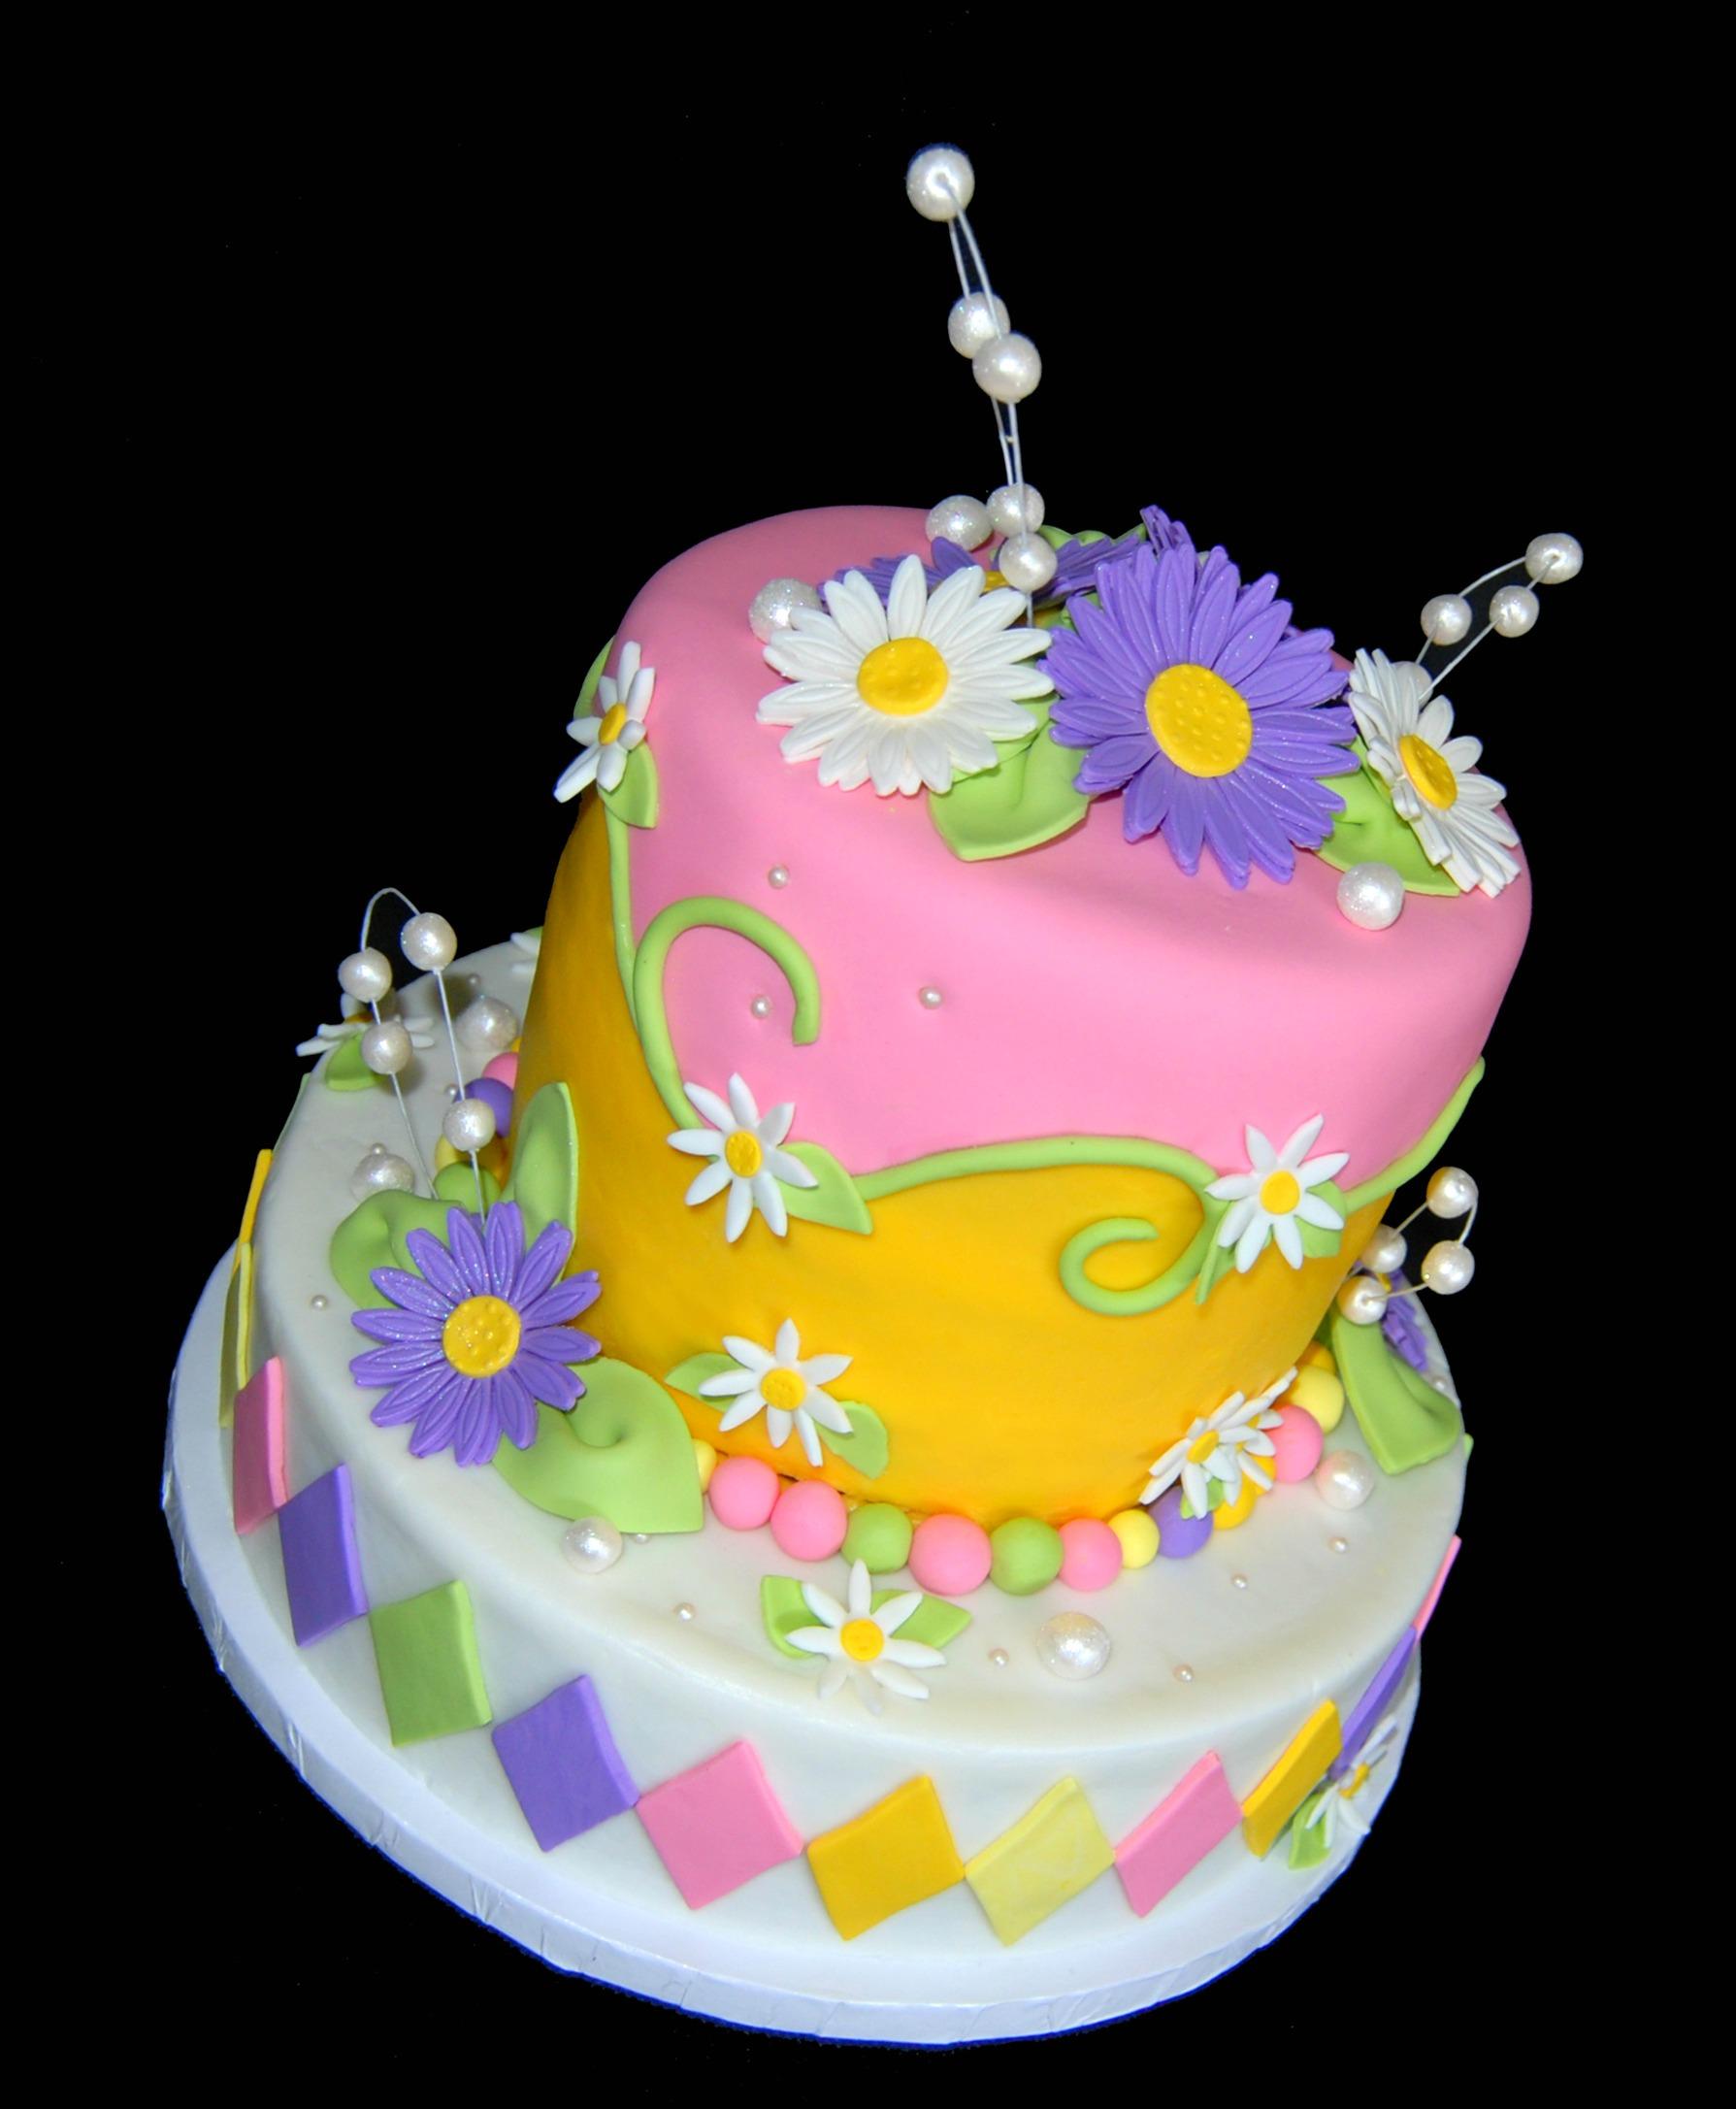 8 Spring Inspired Cake Designs